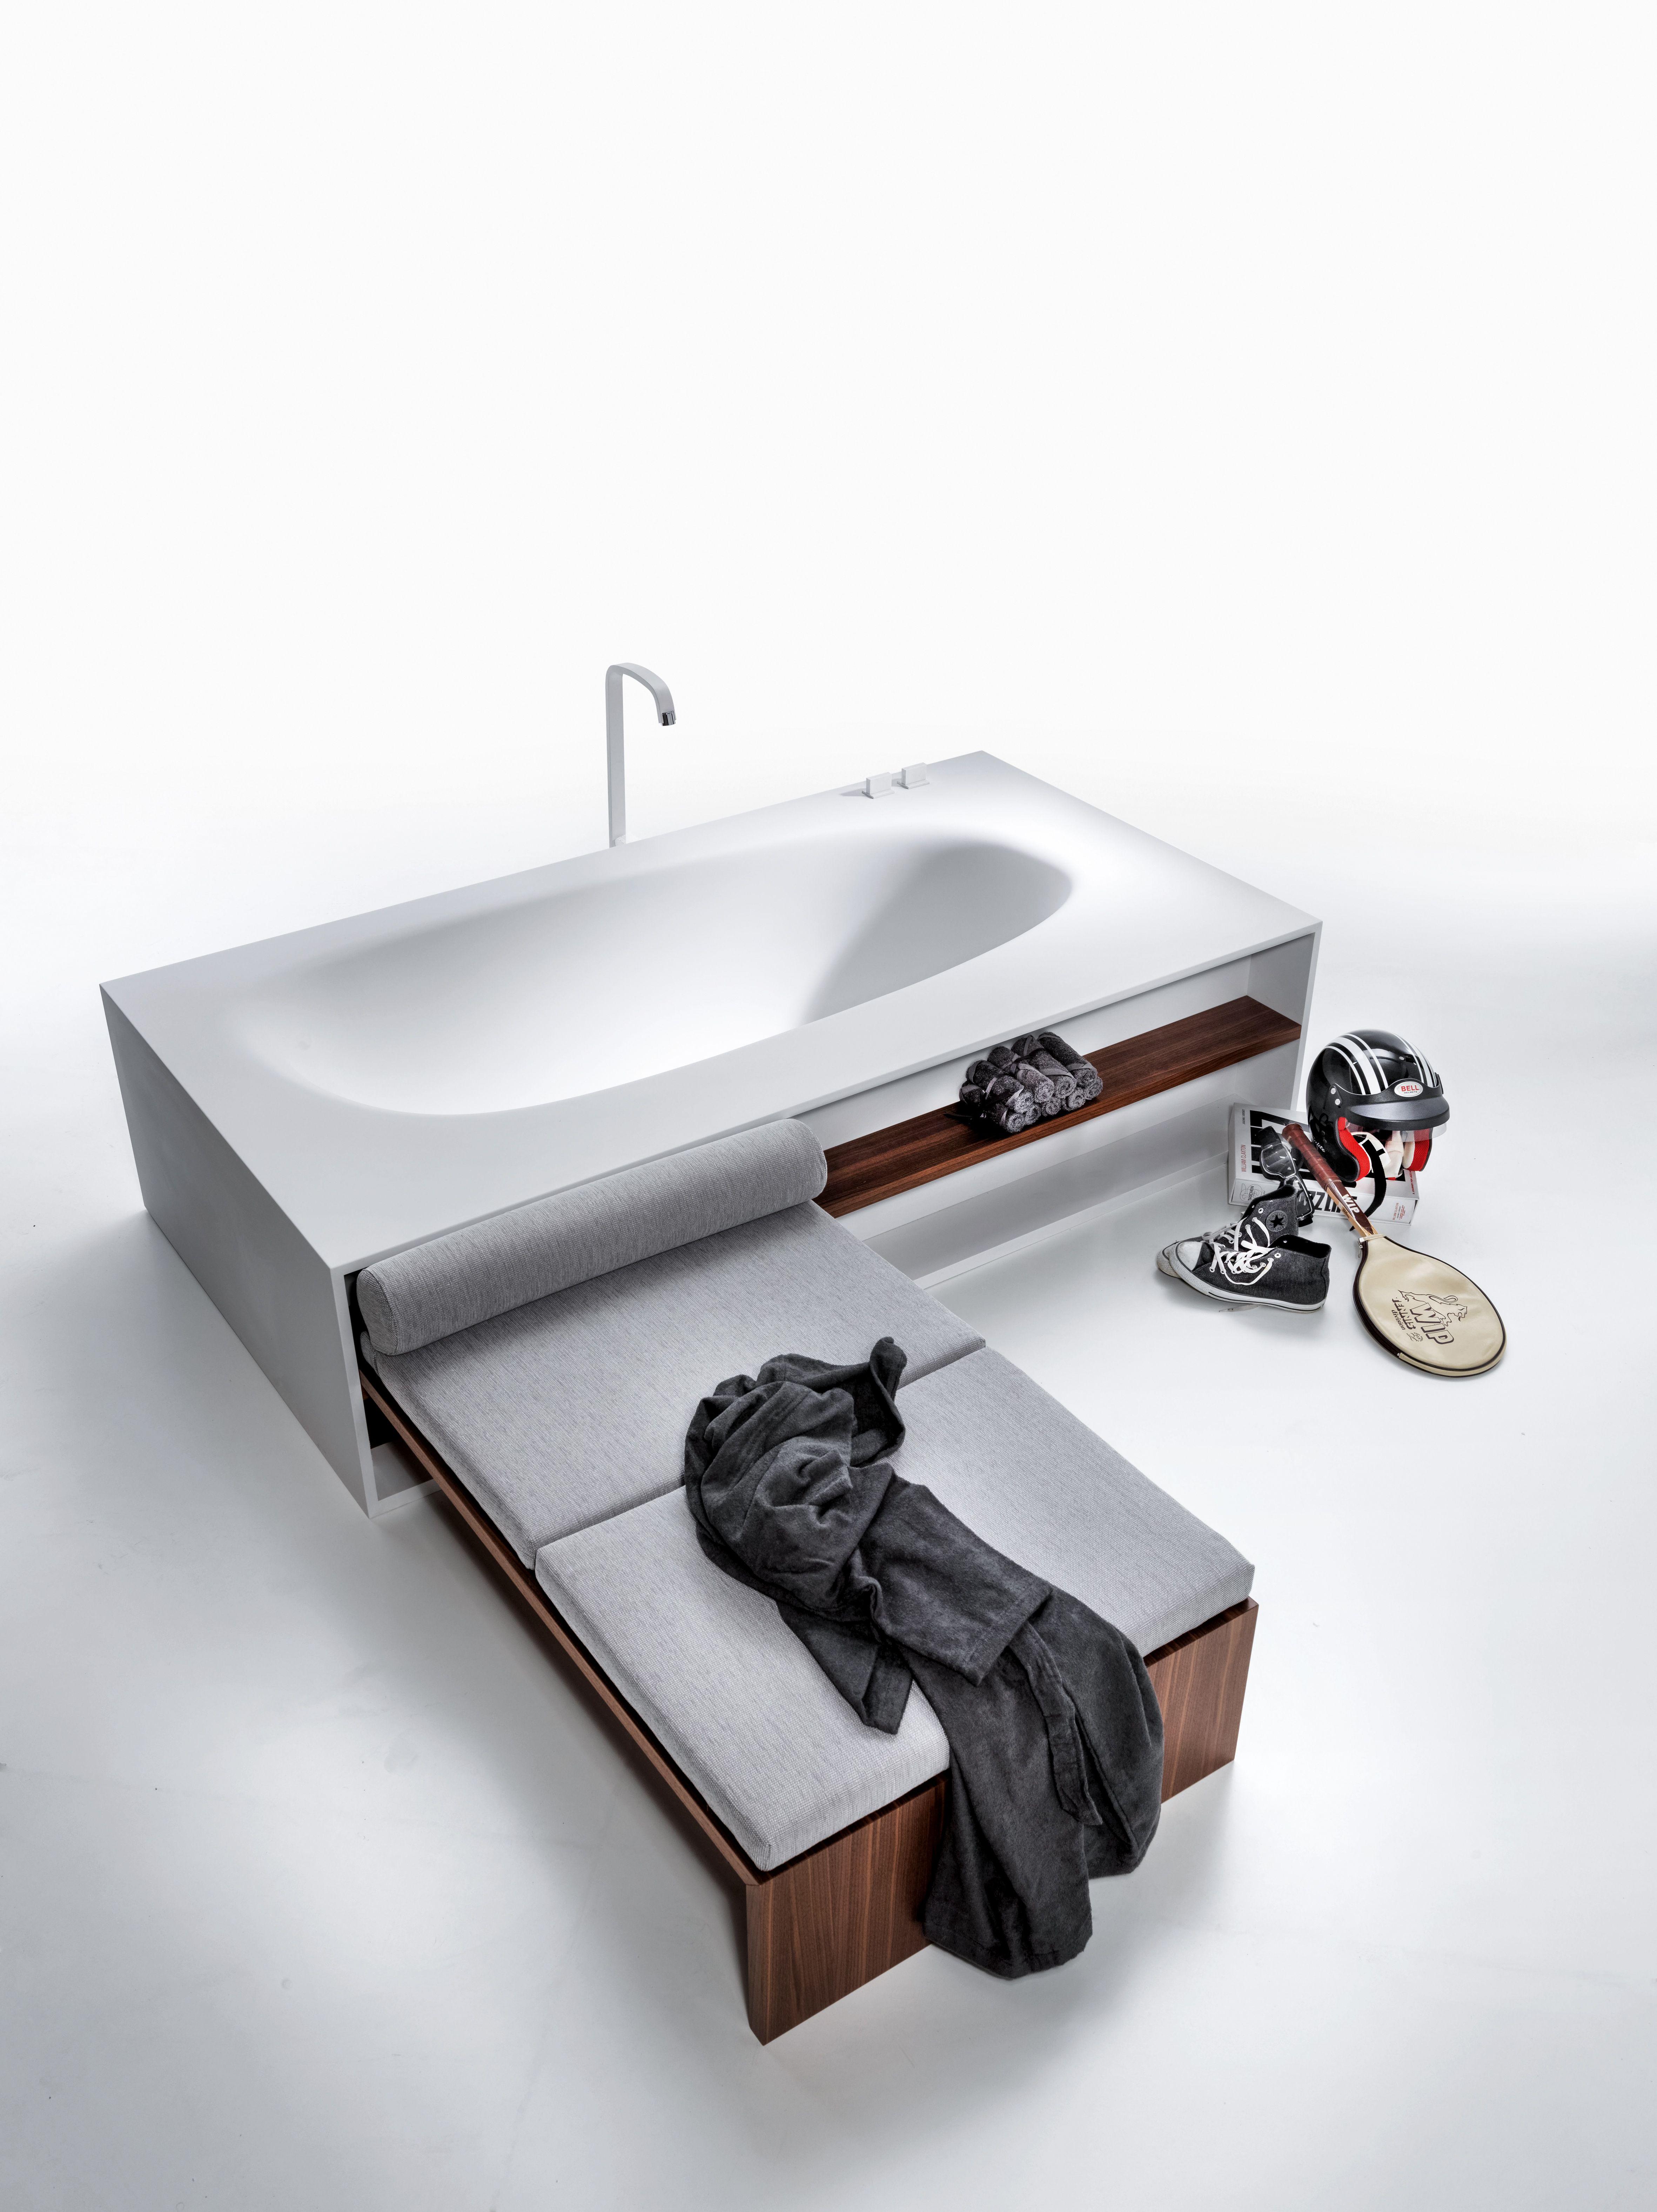 Contemporary Vasca Freestanding Bathtub by Falper Falper